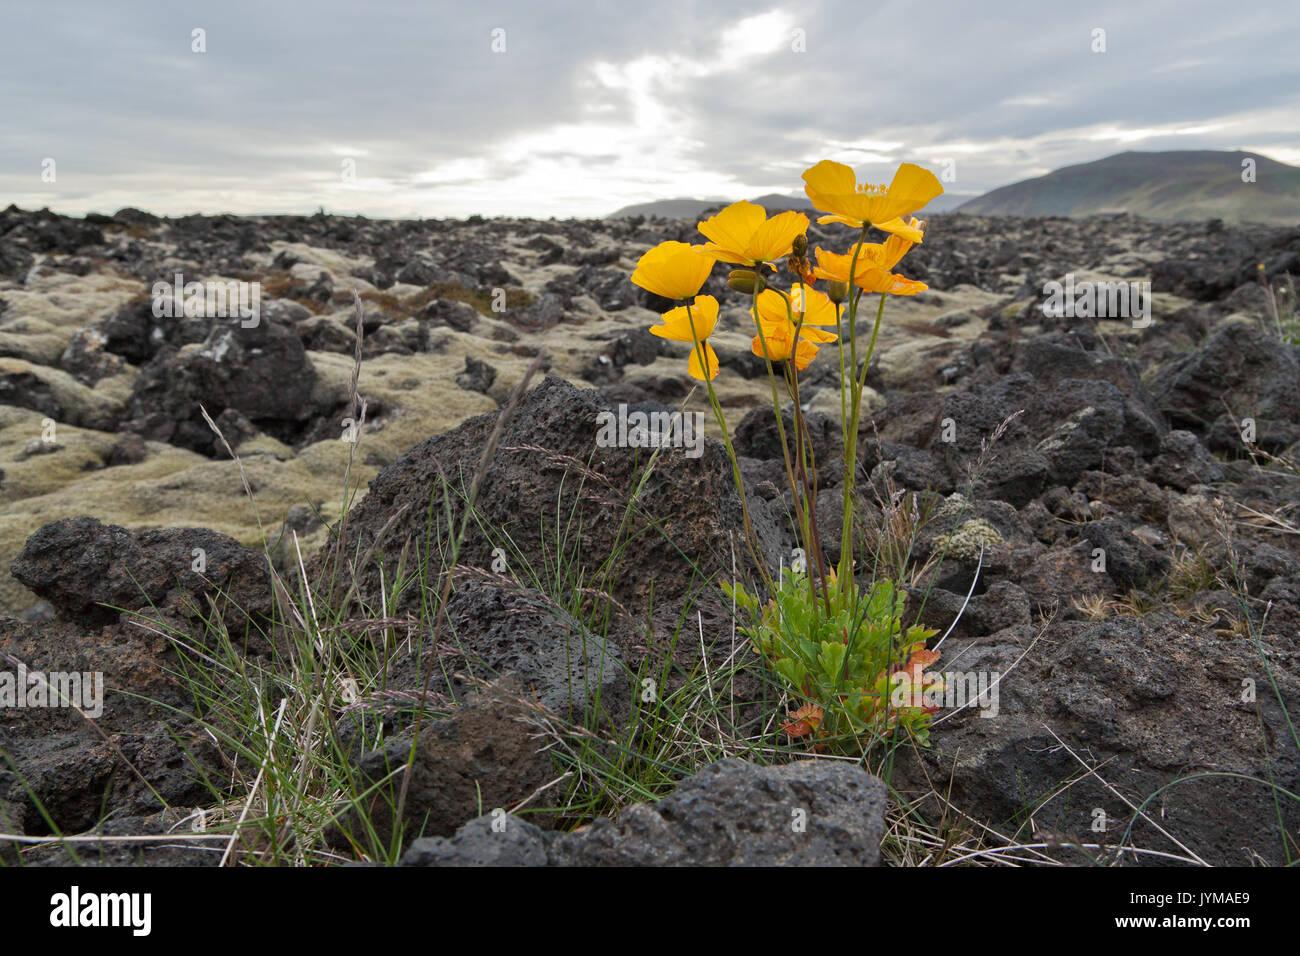 Iceland poppy, Papaver nudicaule on lava field - Stock Image